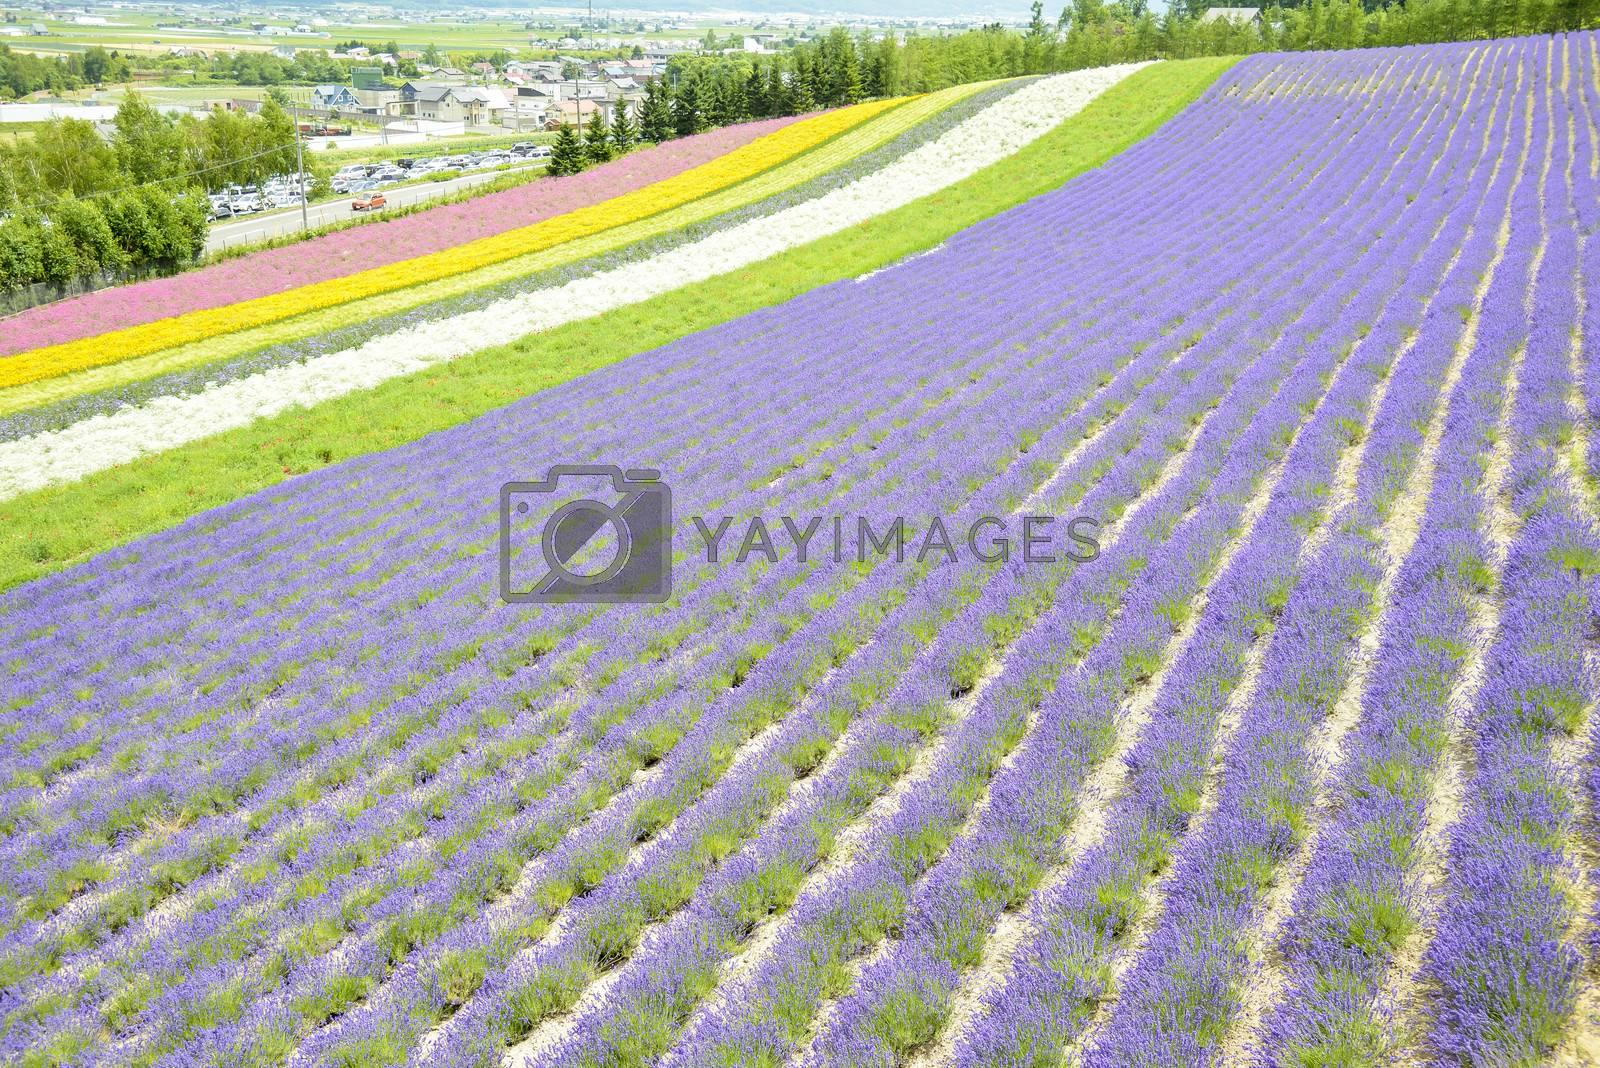 Colorful Lavender farm8